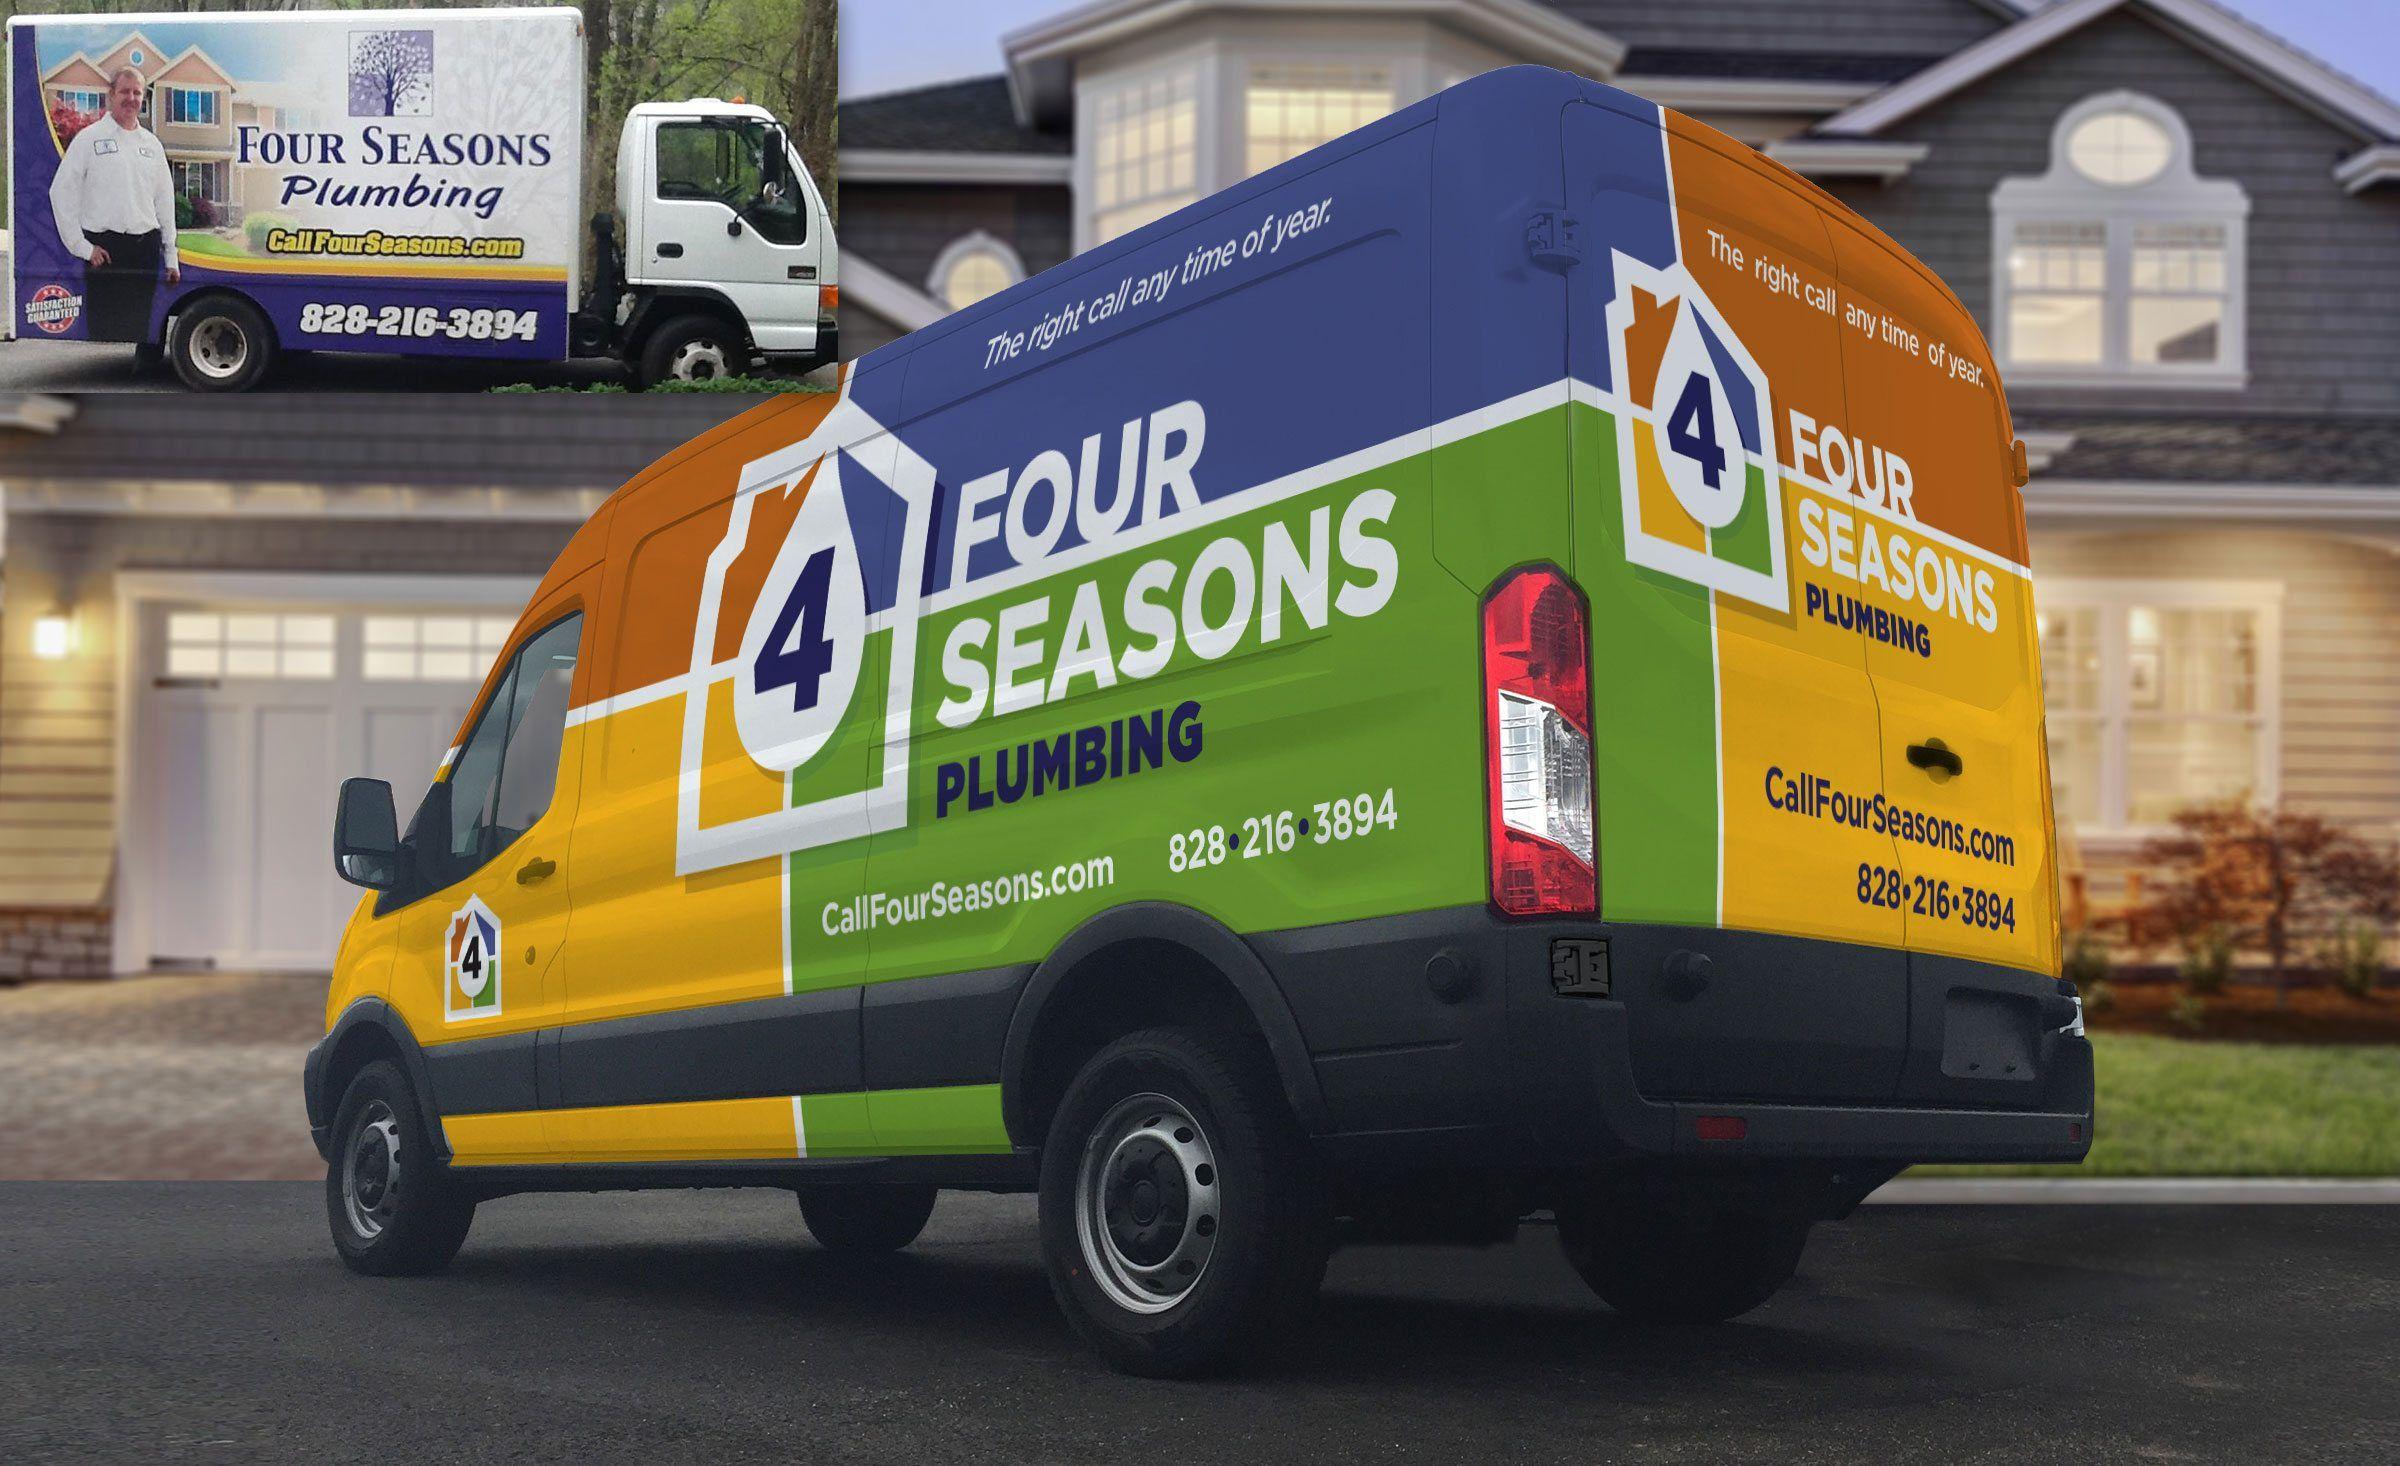 Four Seasons Plumbing Kickcharge Creative Plumbing Logo Design